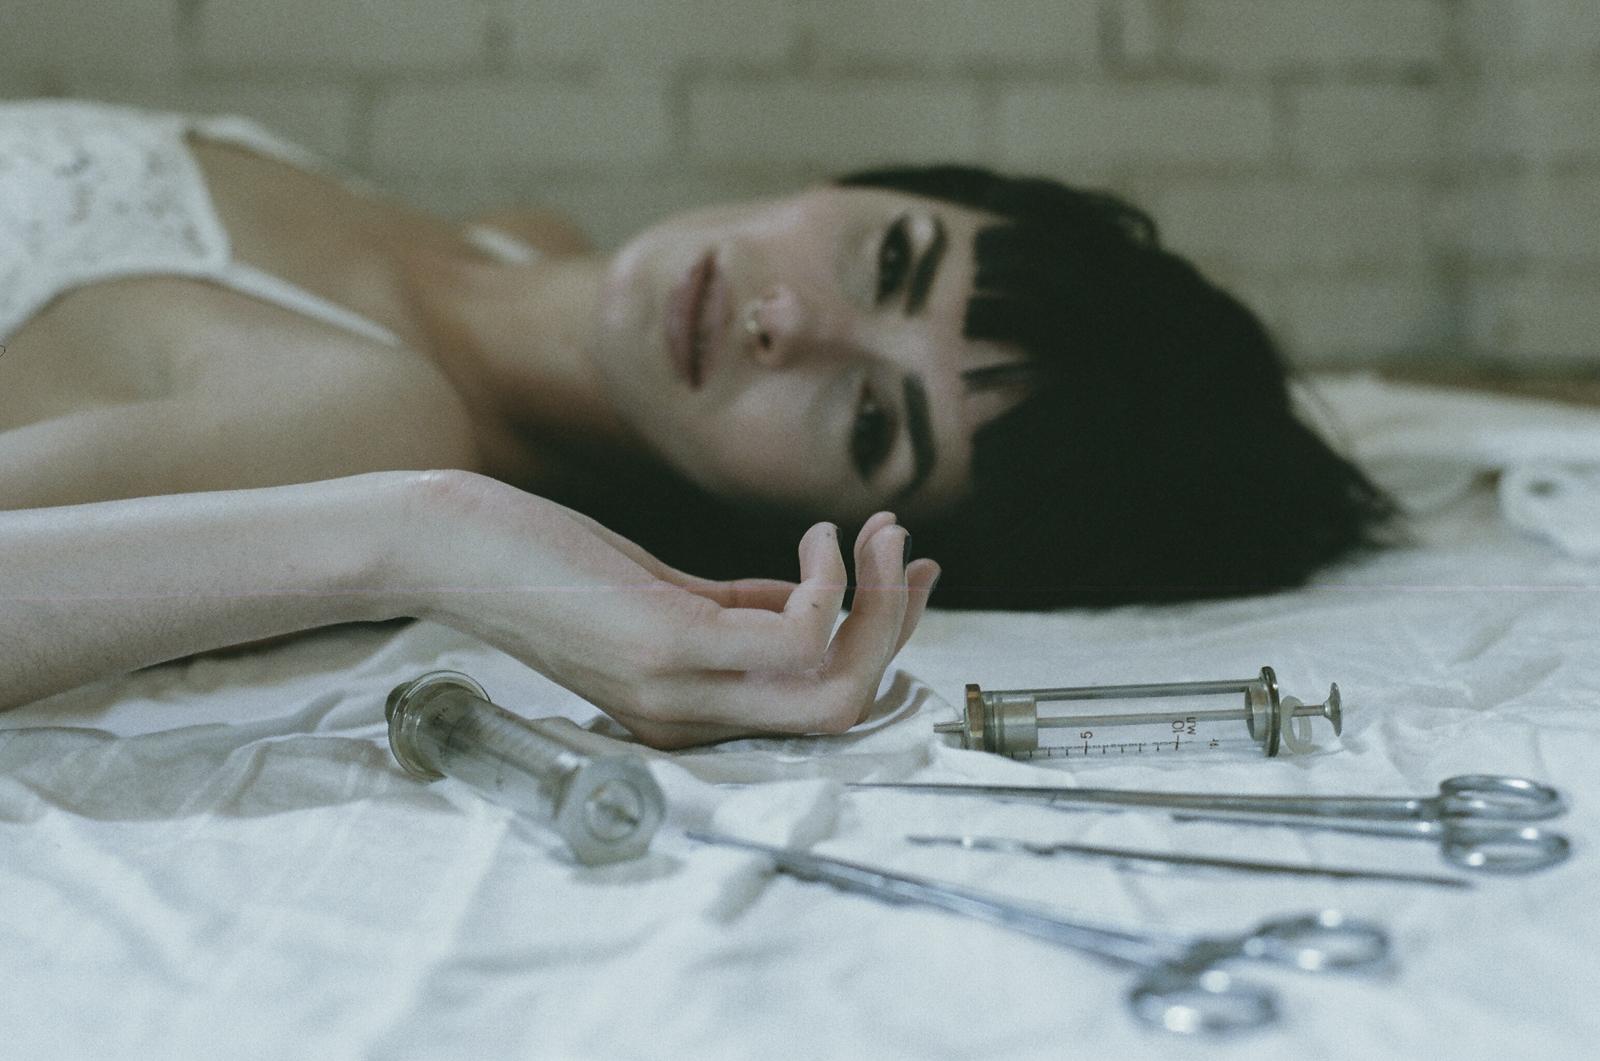 Jillian xenia conceptual 35mm film